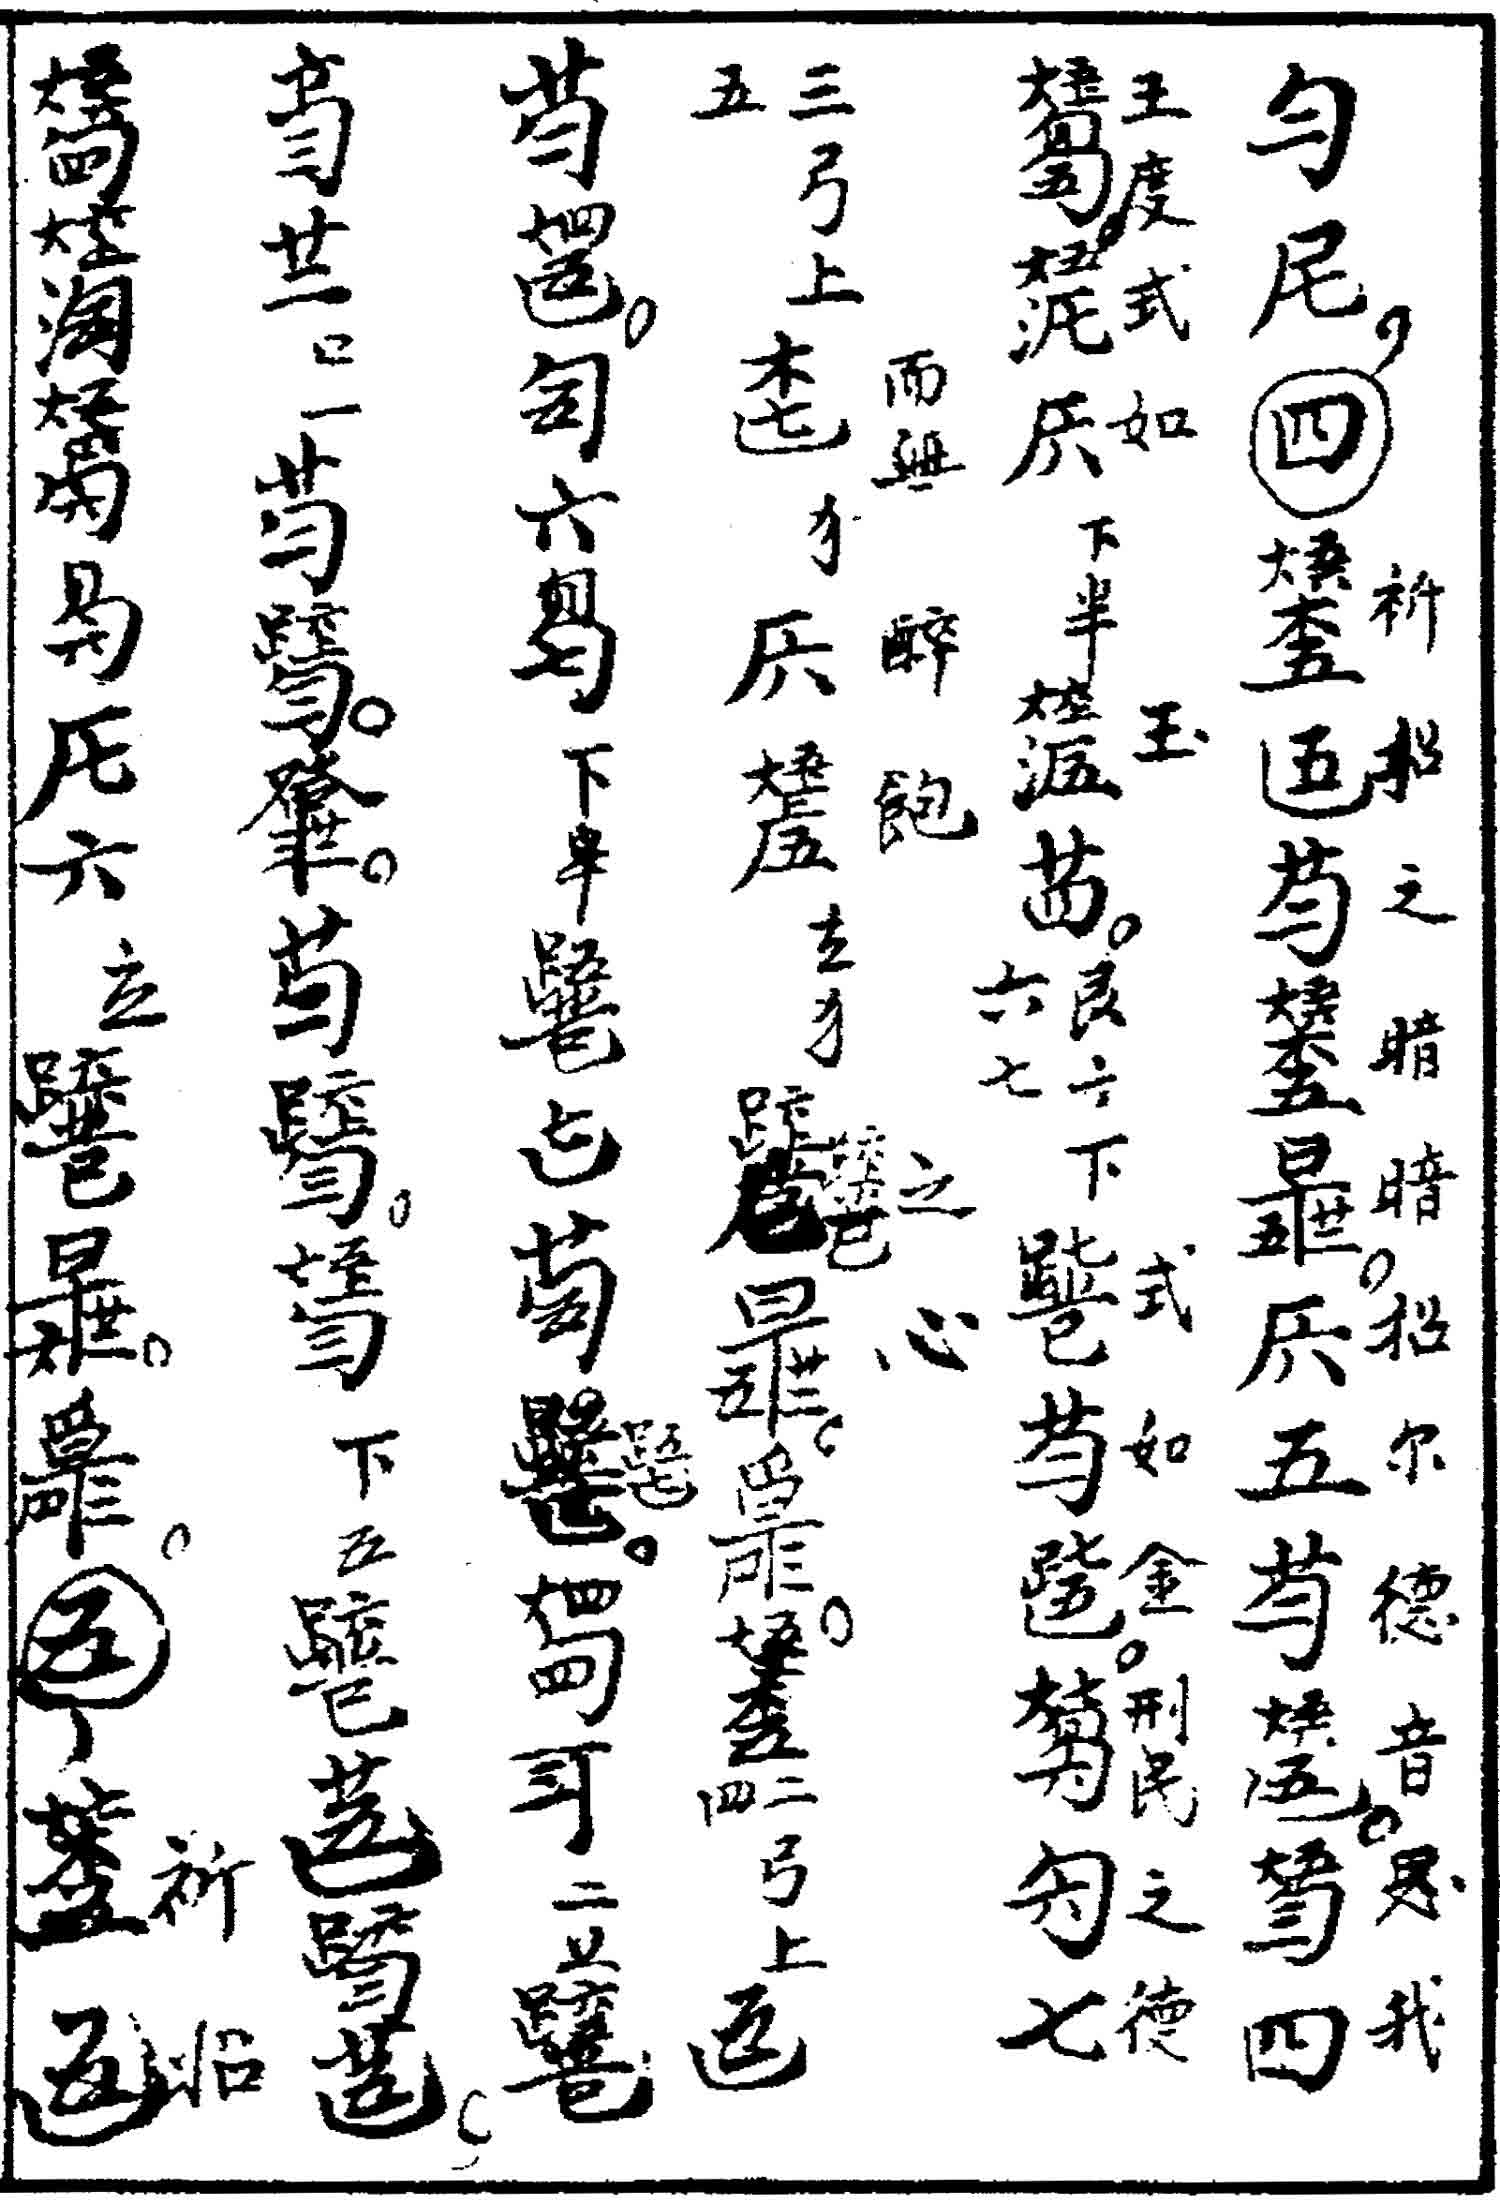 moufu kuang jun: moufu admonishes his lord